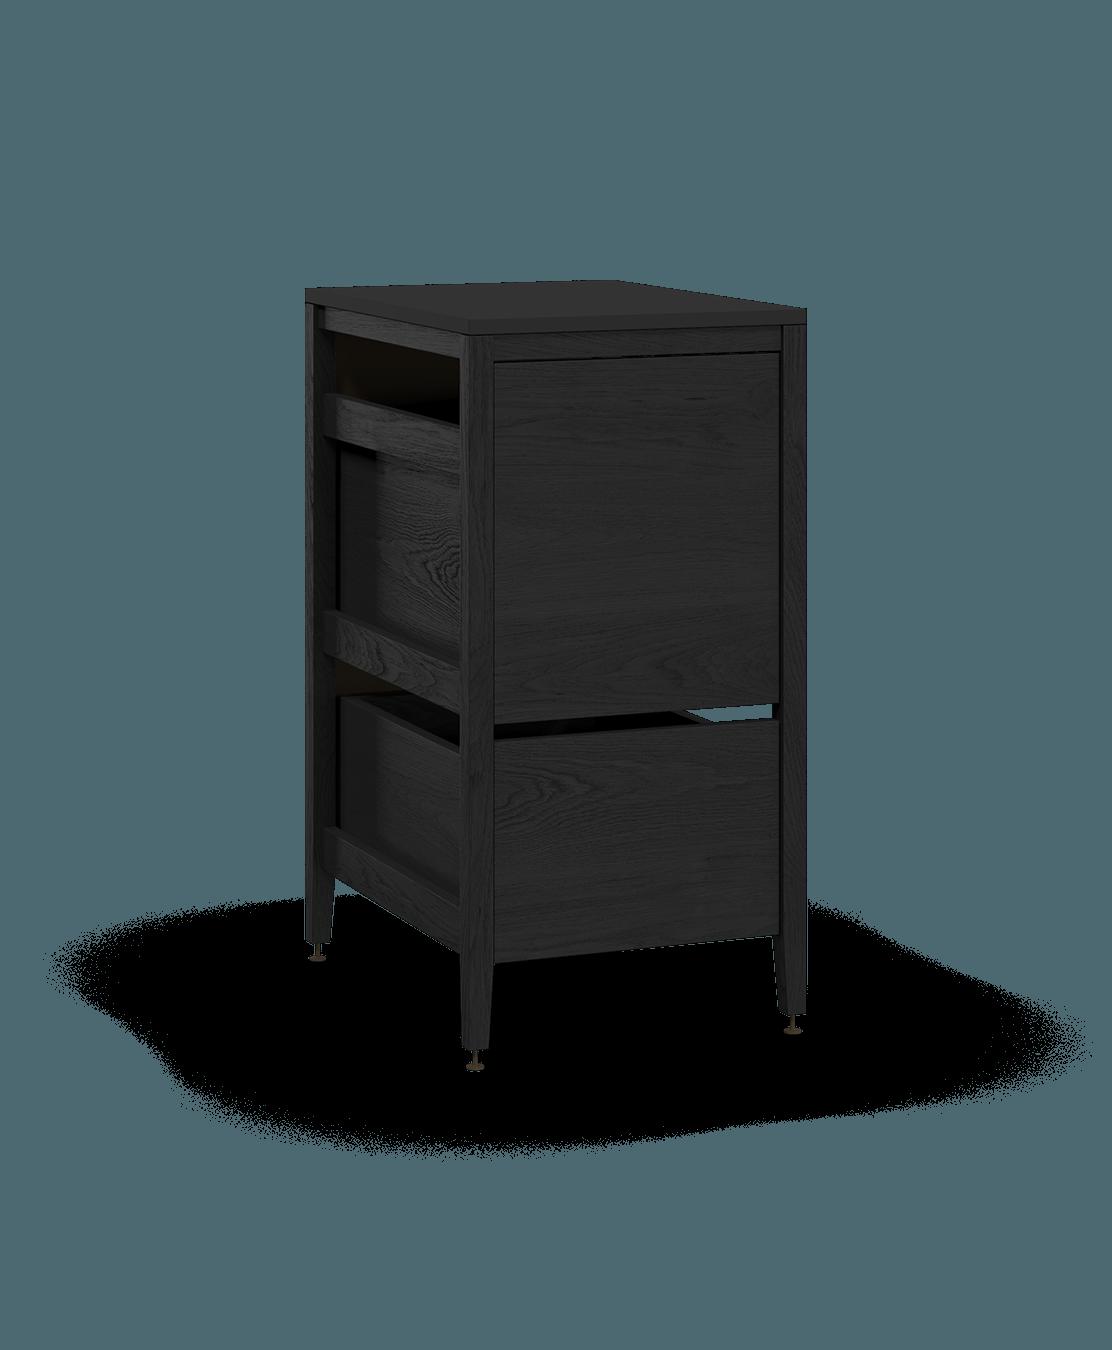 coquo radix midnight black stained oak solid wood modular 1 drawer 2 bins trash base kitchen cabinet 18 inch C1-CTR-18TB-2001-BK